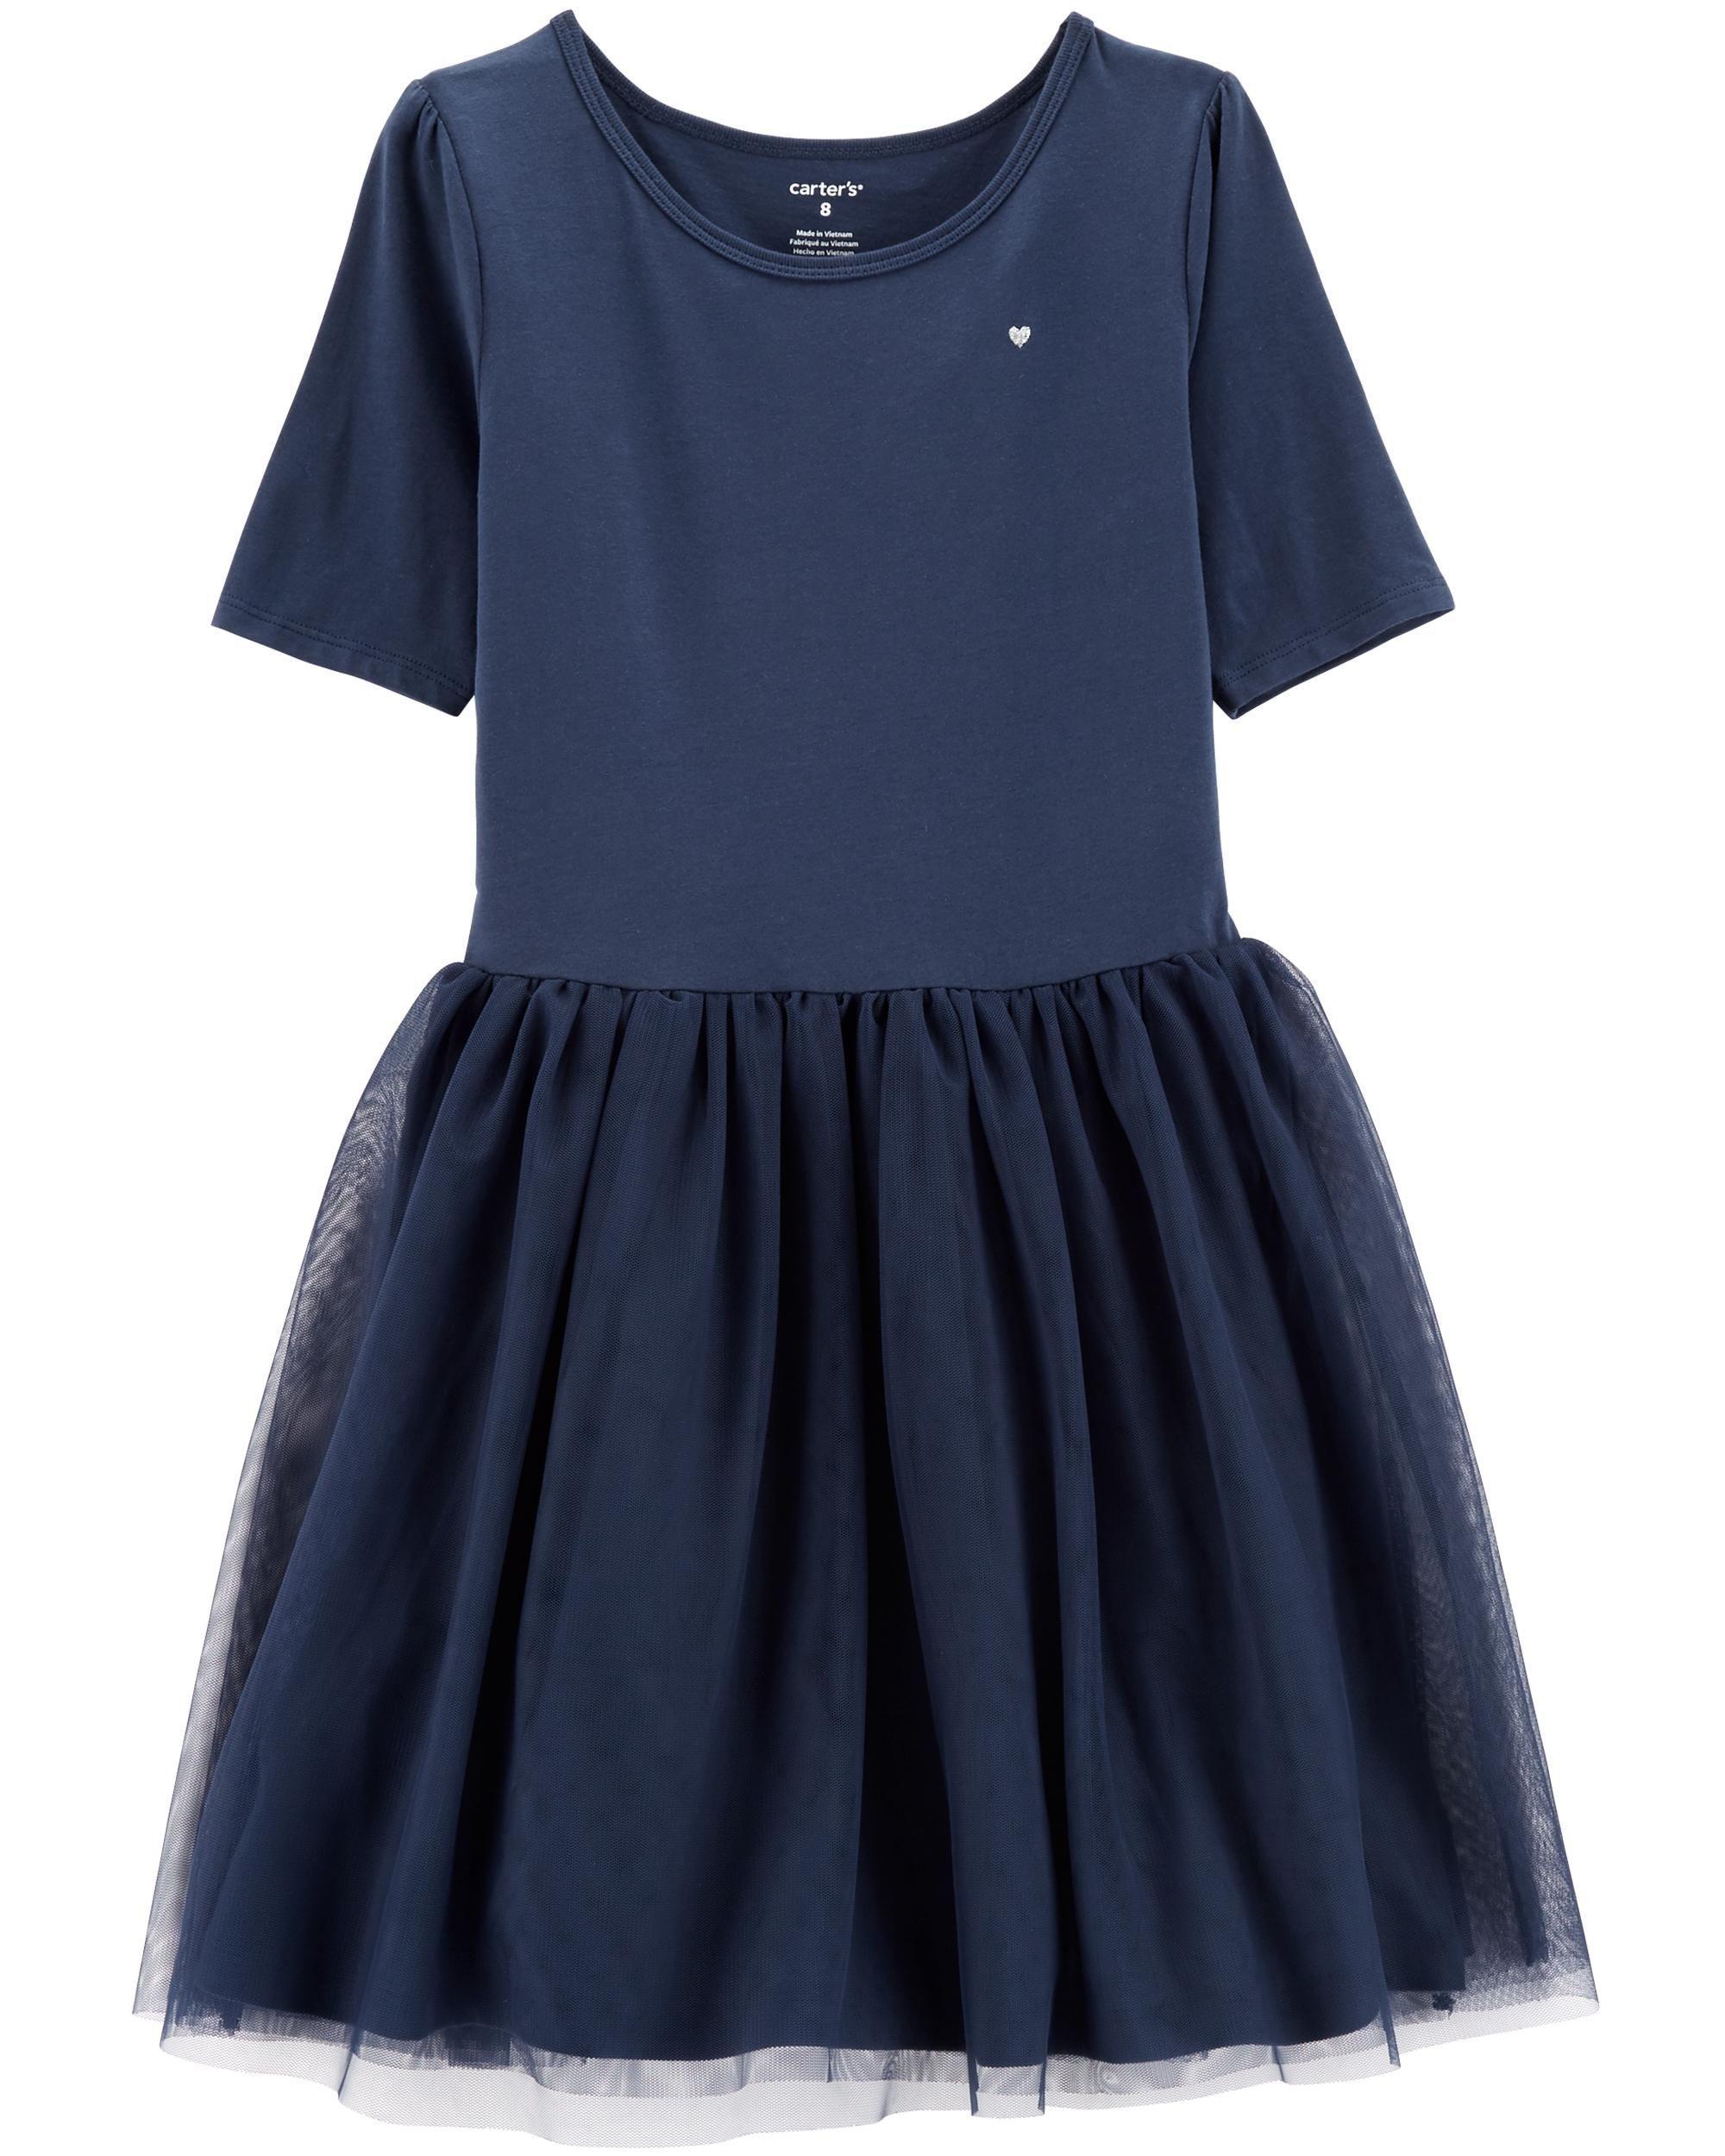 36ee6f96b5eed Heart Tutu Dress | Wear It | Dresses kids girl, Boys fashion dress ...